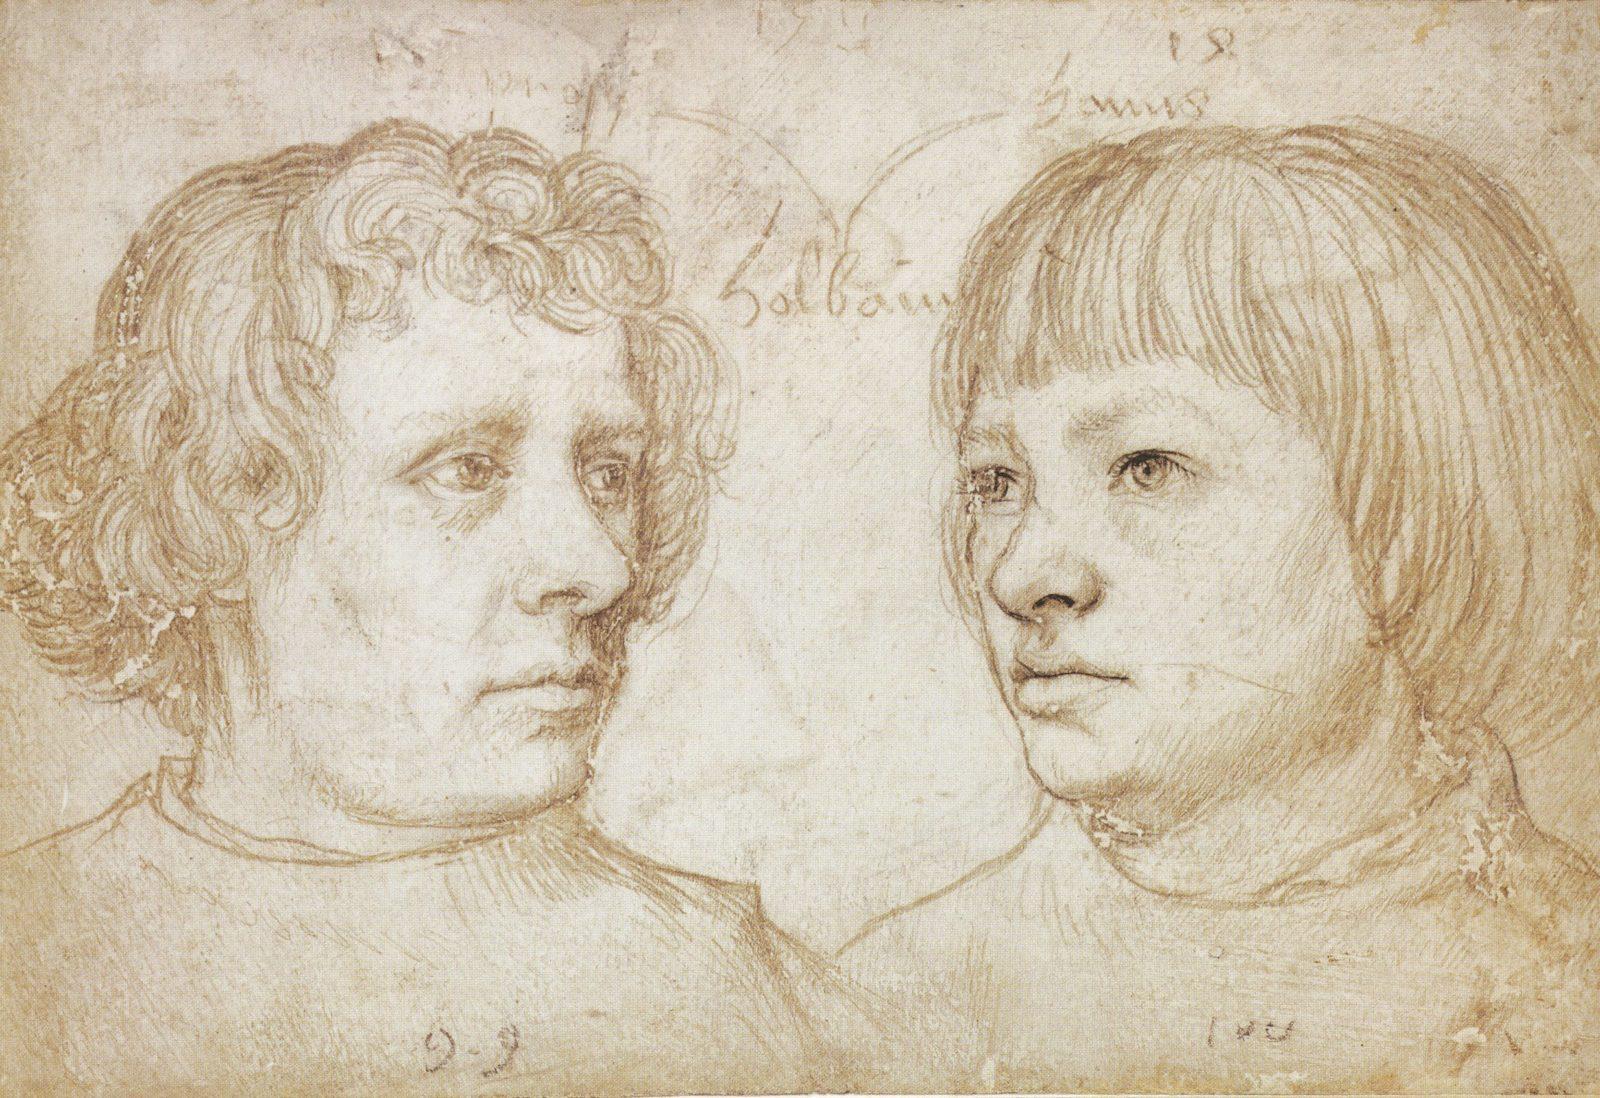 Ambrosius e Hans Holbein, Hans Holbein il Vecchio